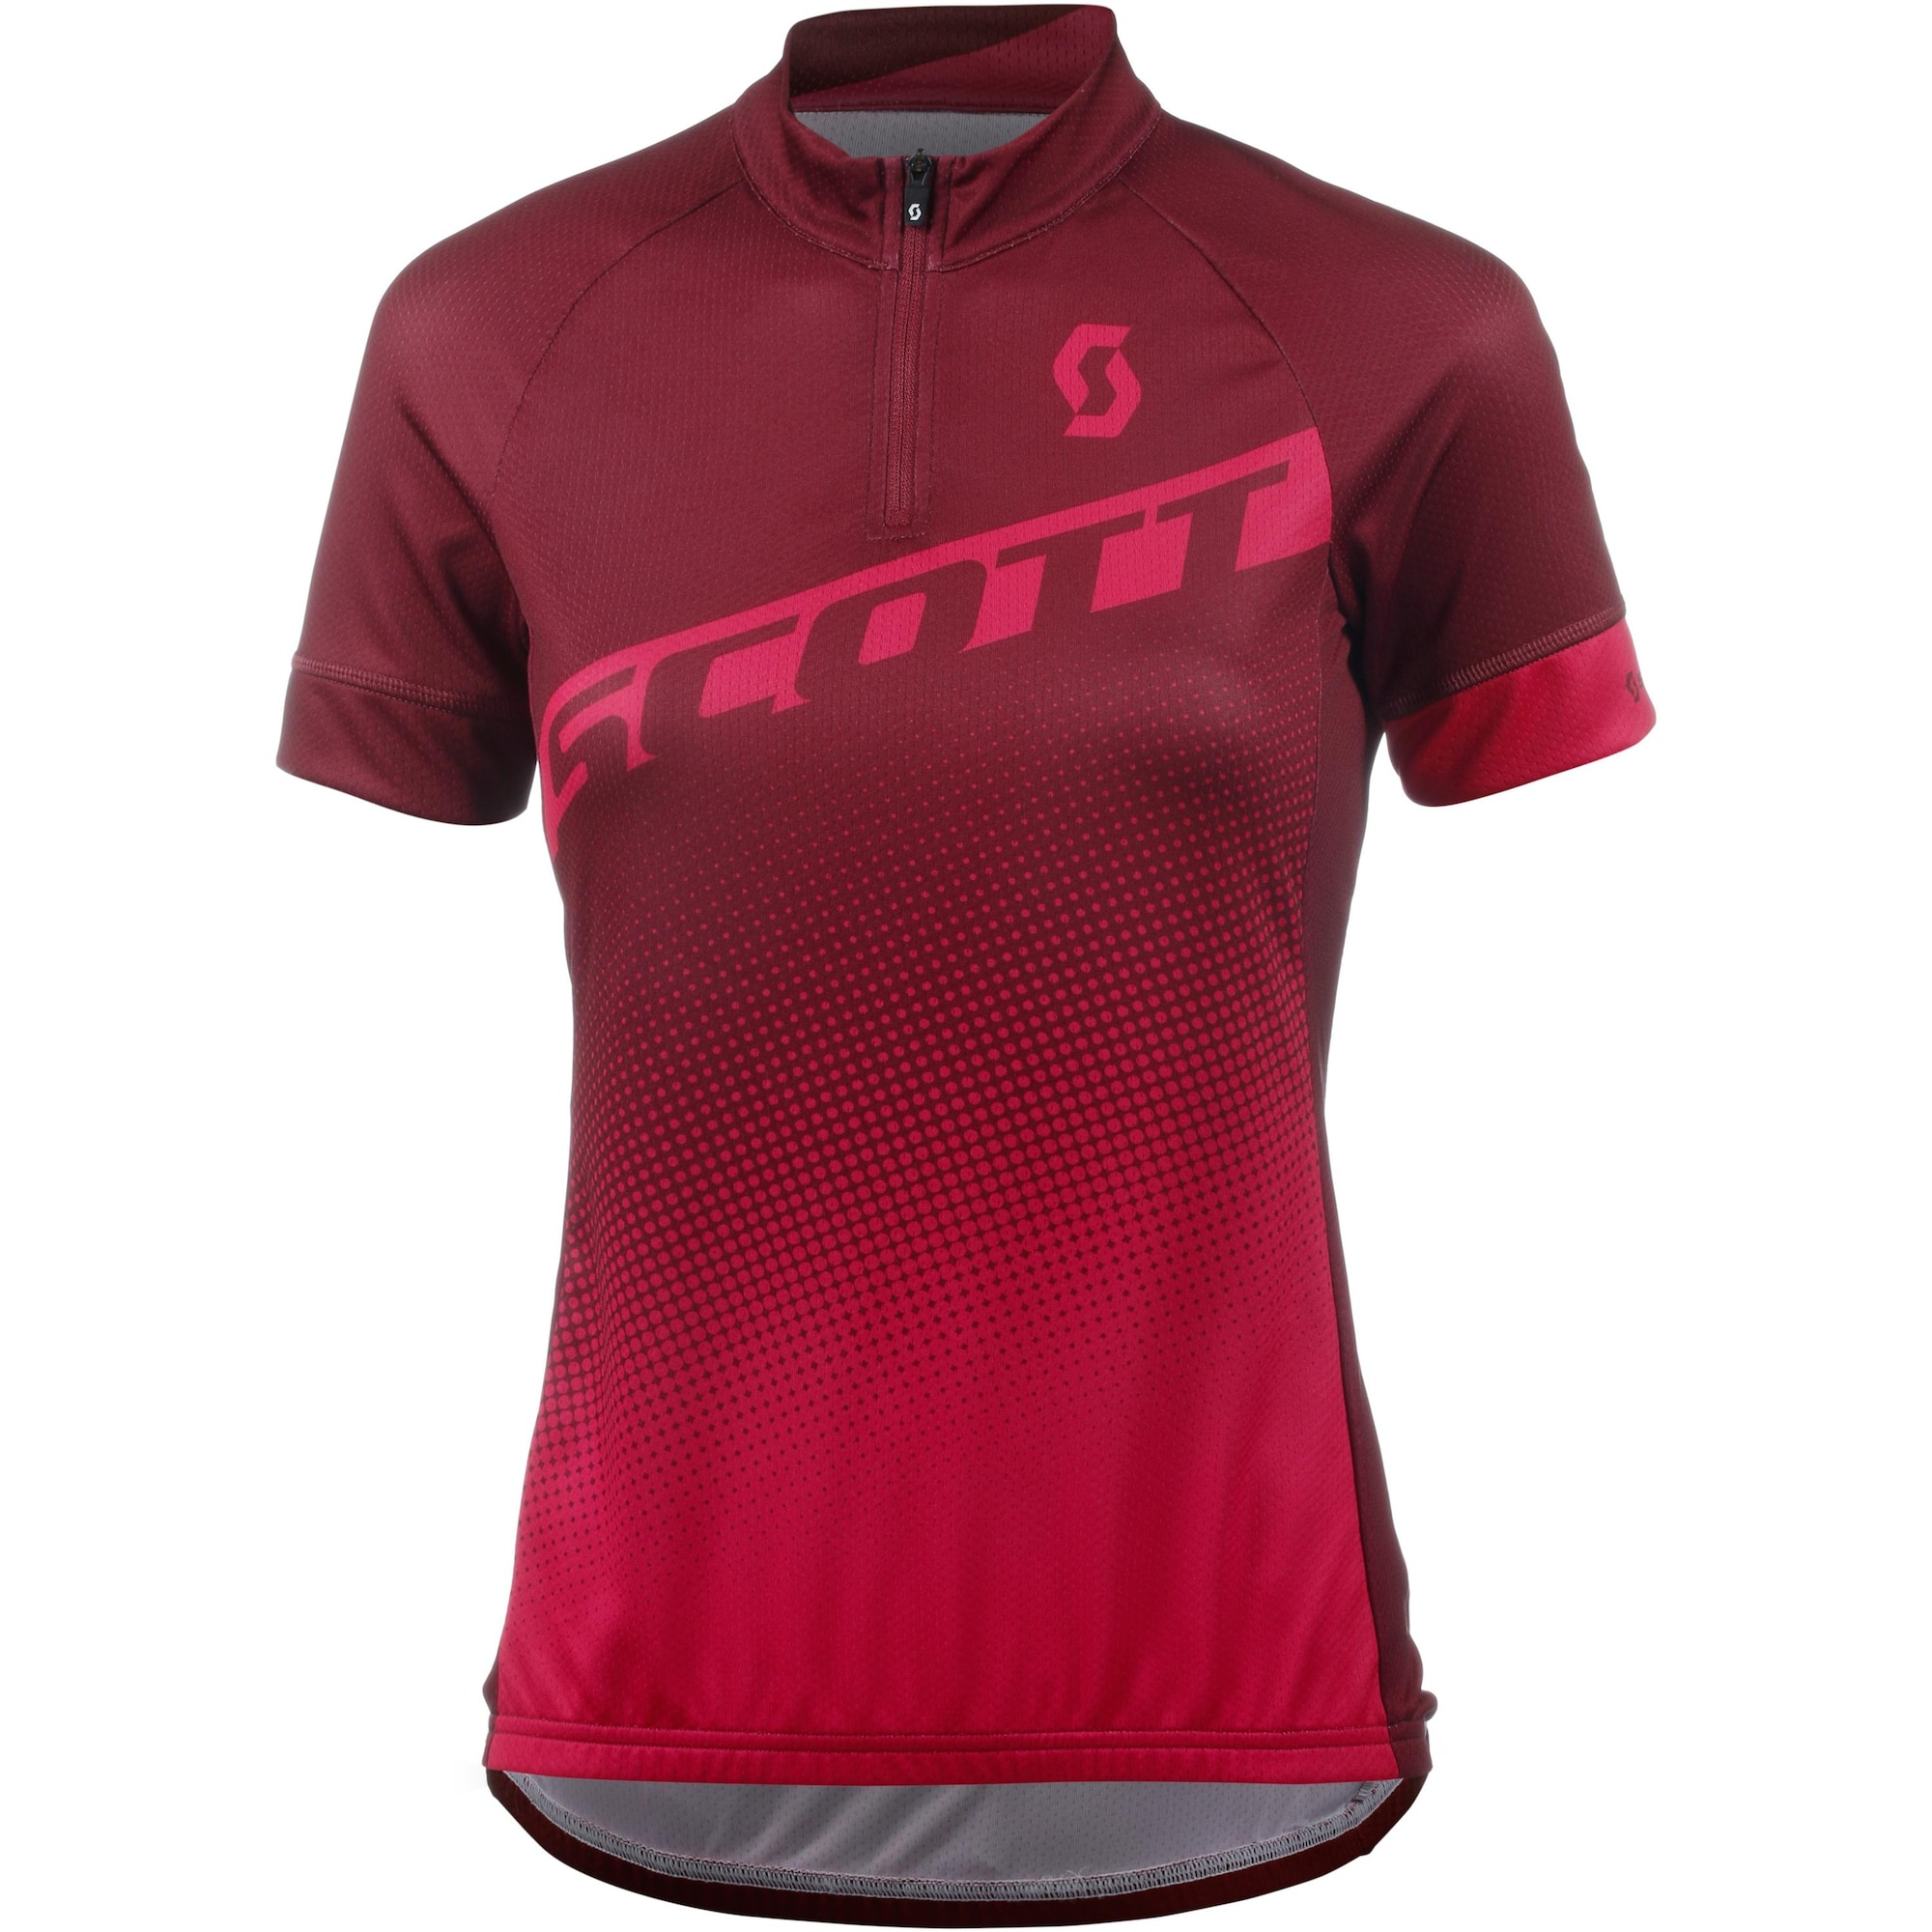 Fahrradtrikot 'Endurance 40'   Sportbekleidung > Trikots   Scott